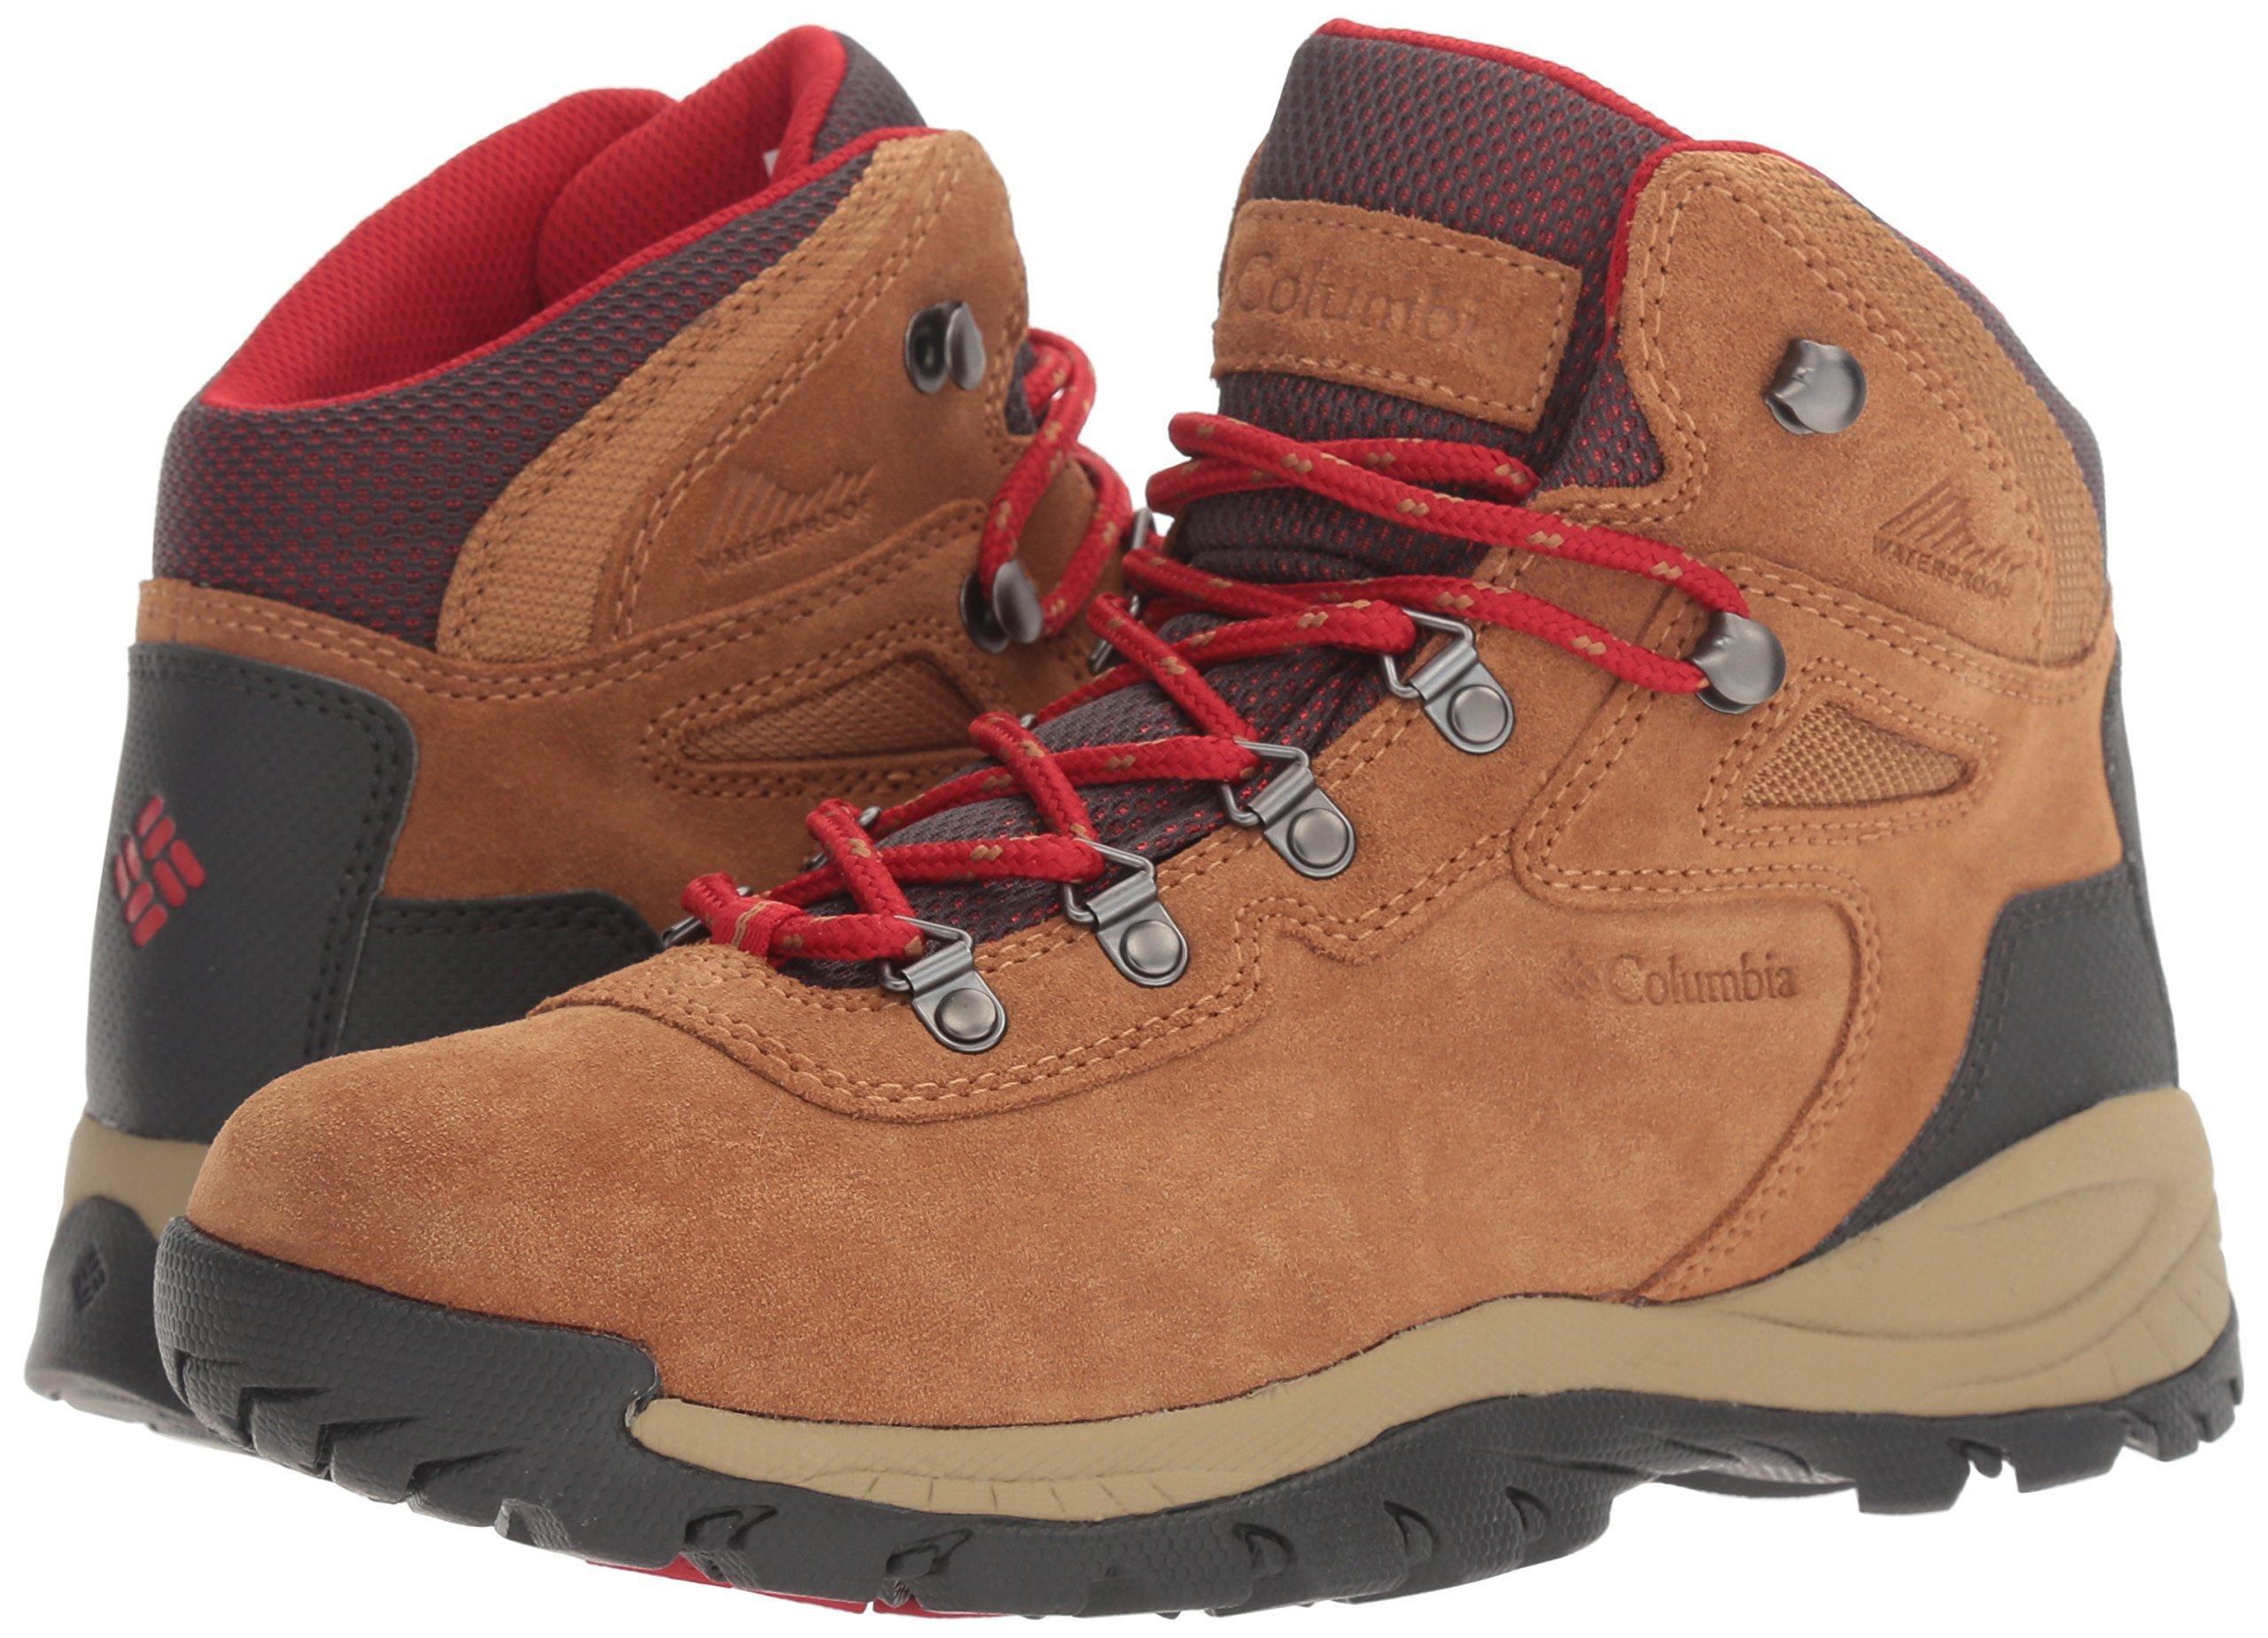 Columbia Women's Newton Ridge Plus Waterproof Amped Hiking Boot, Elk, Mountain Red, 7.5 B US by Columbia (Image #6)